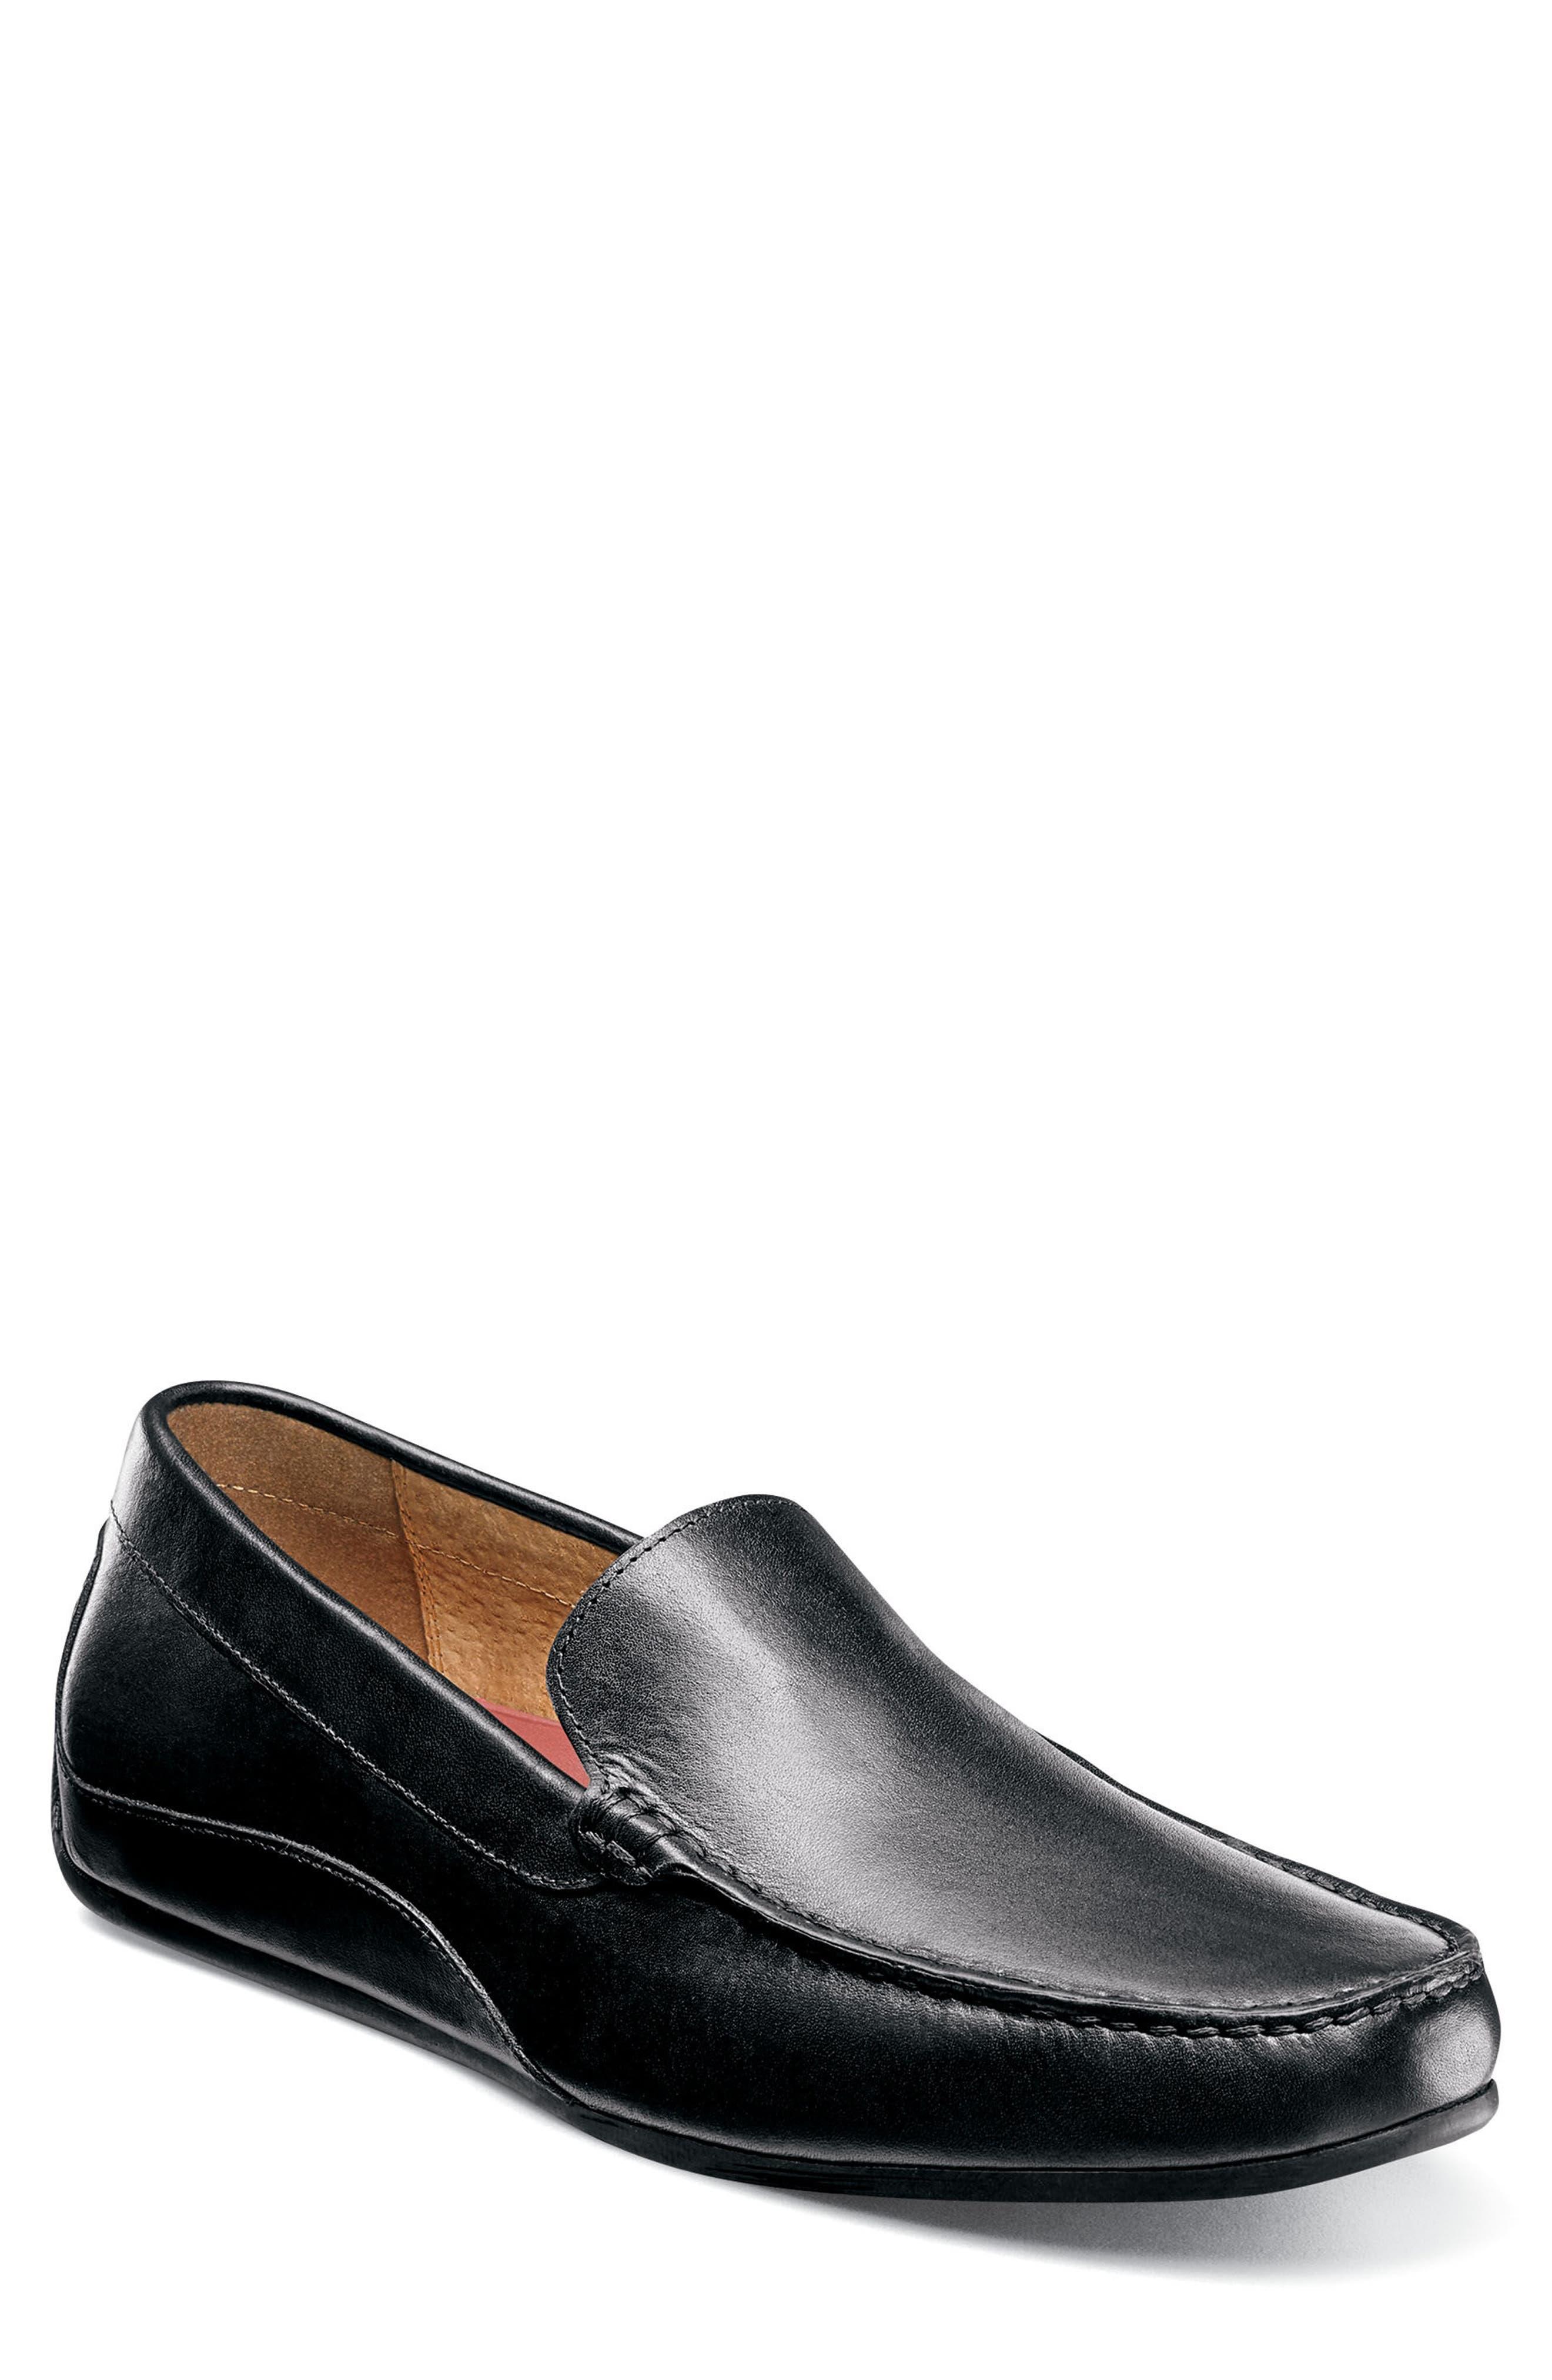 FLORSHEIM Oval Driving Shoe, Main, color, BLACK LEATHER